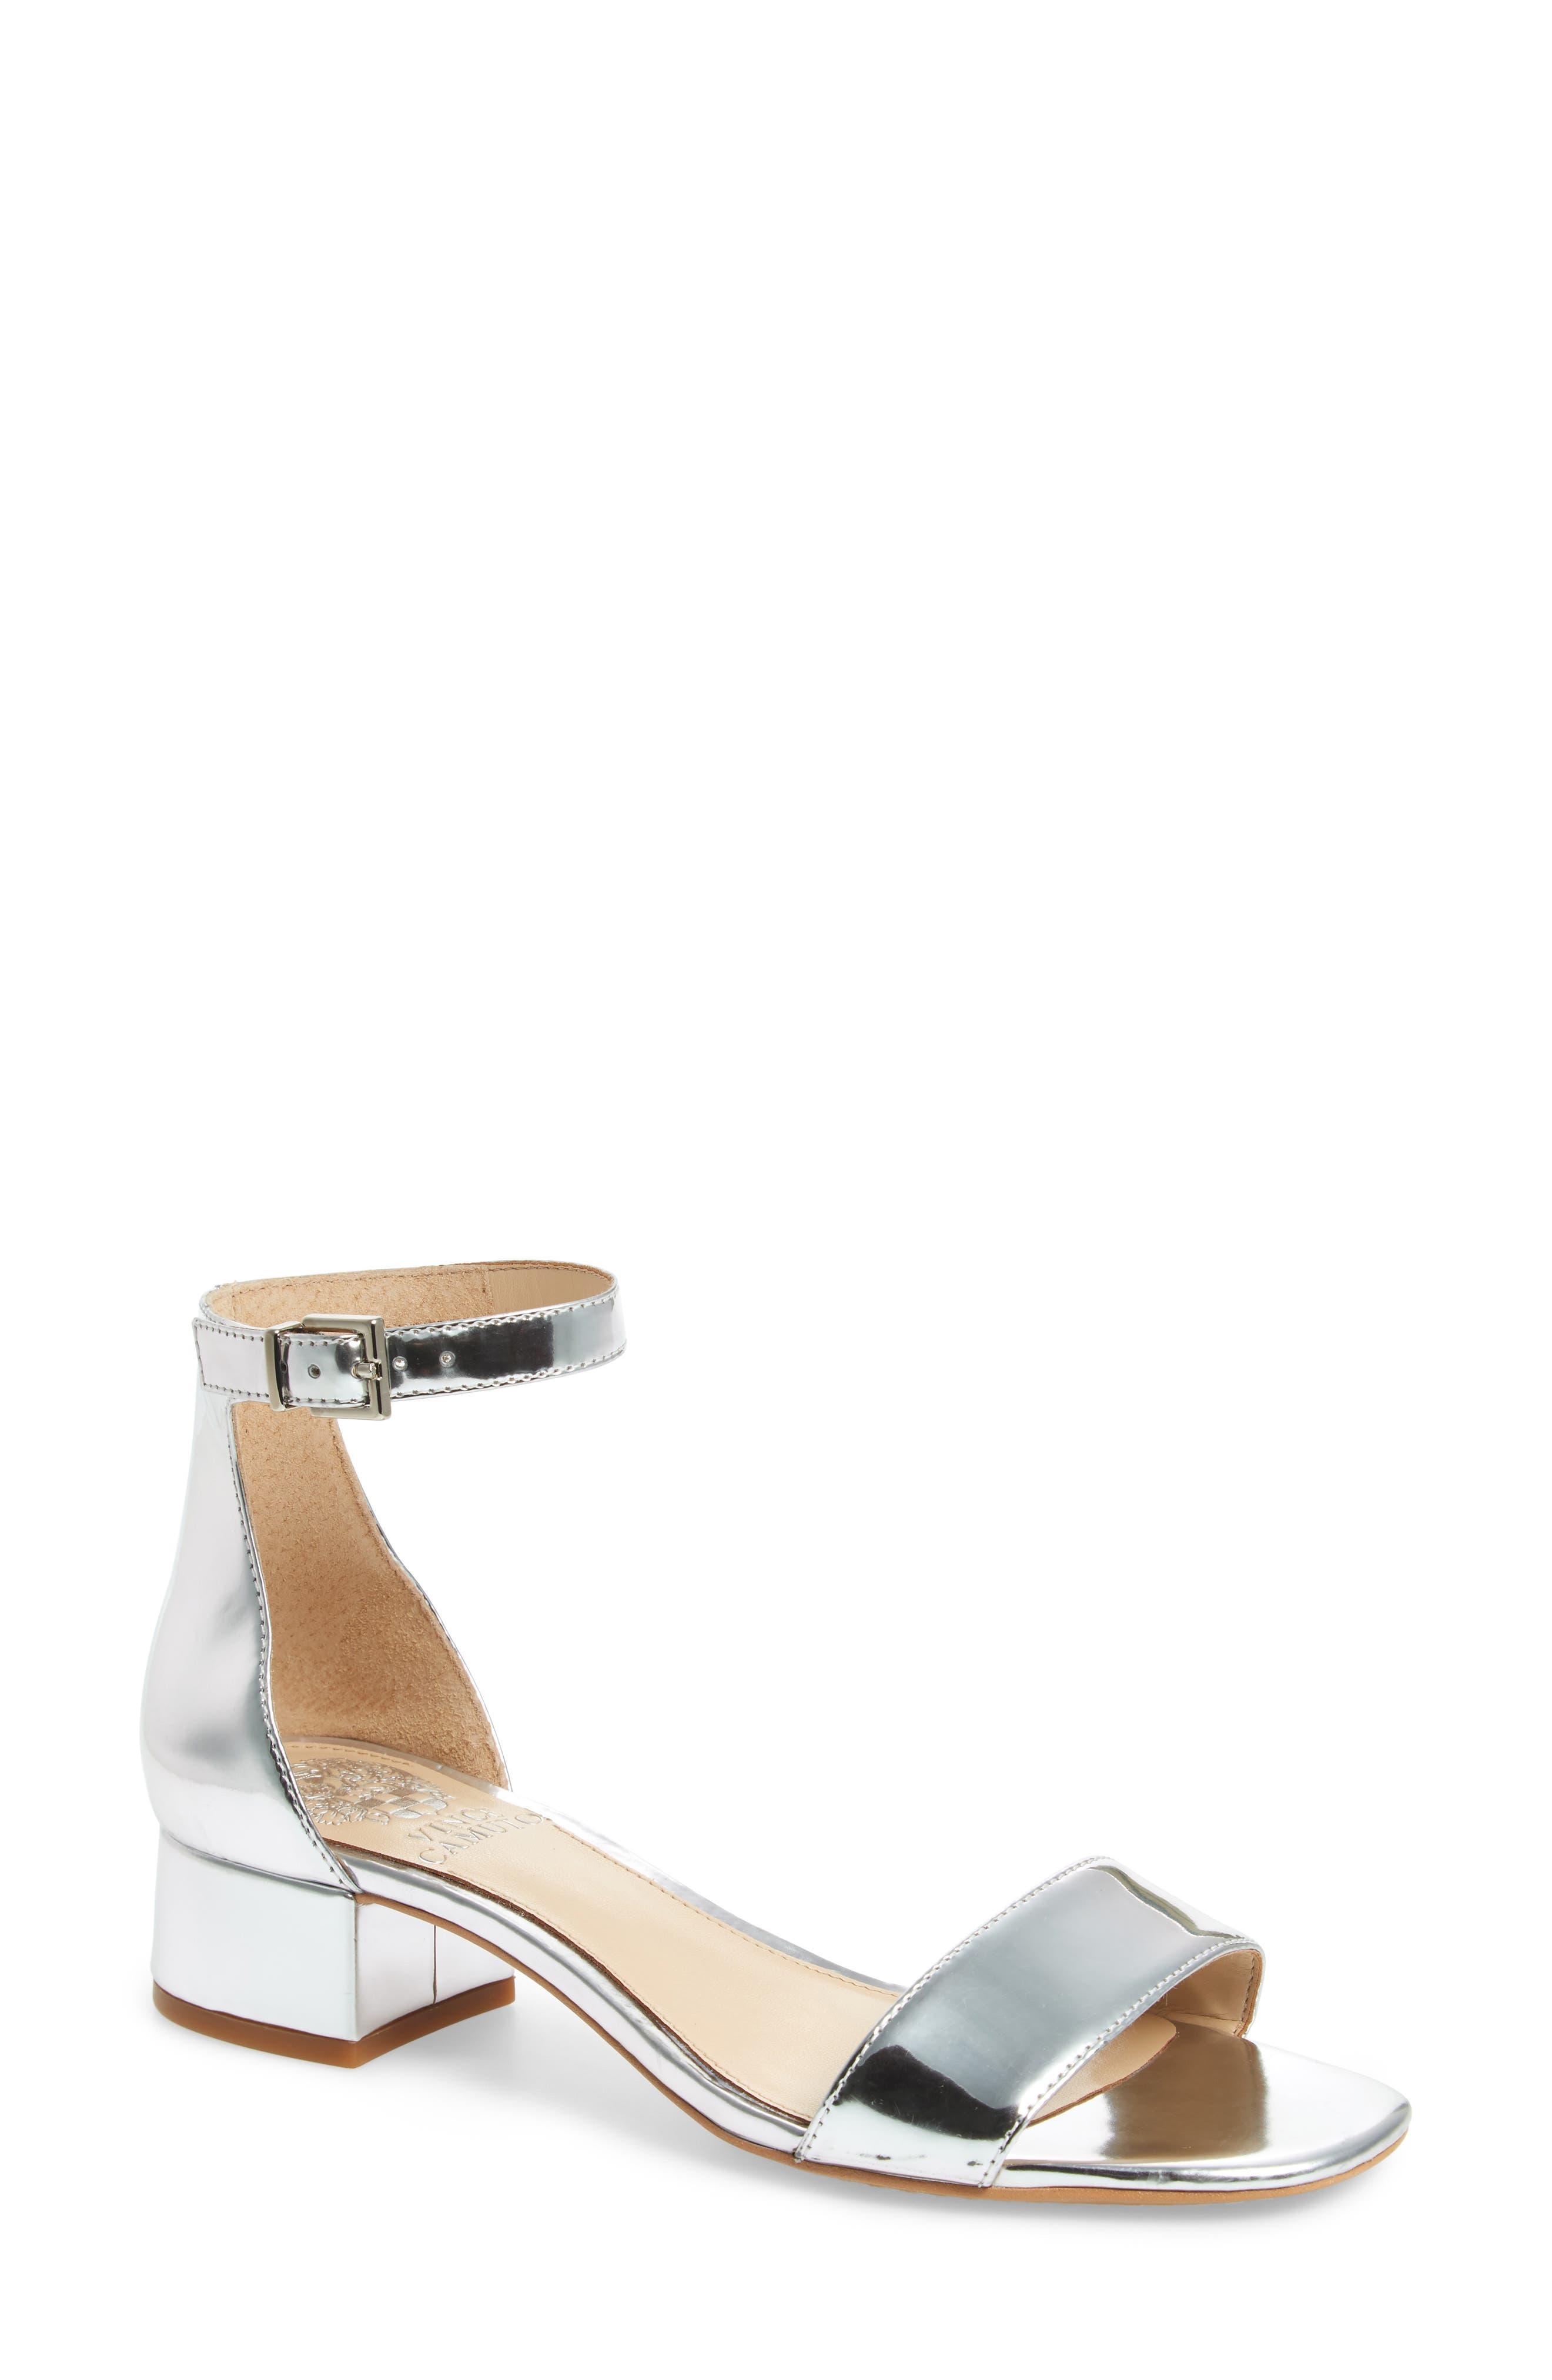 Sasseta Sandal,                         Main,                         color, Bright Silver